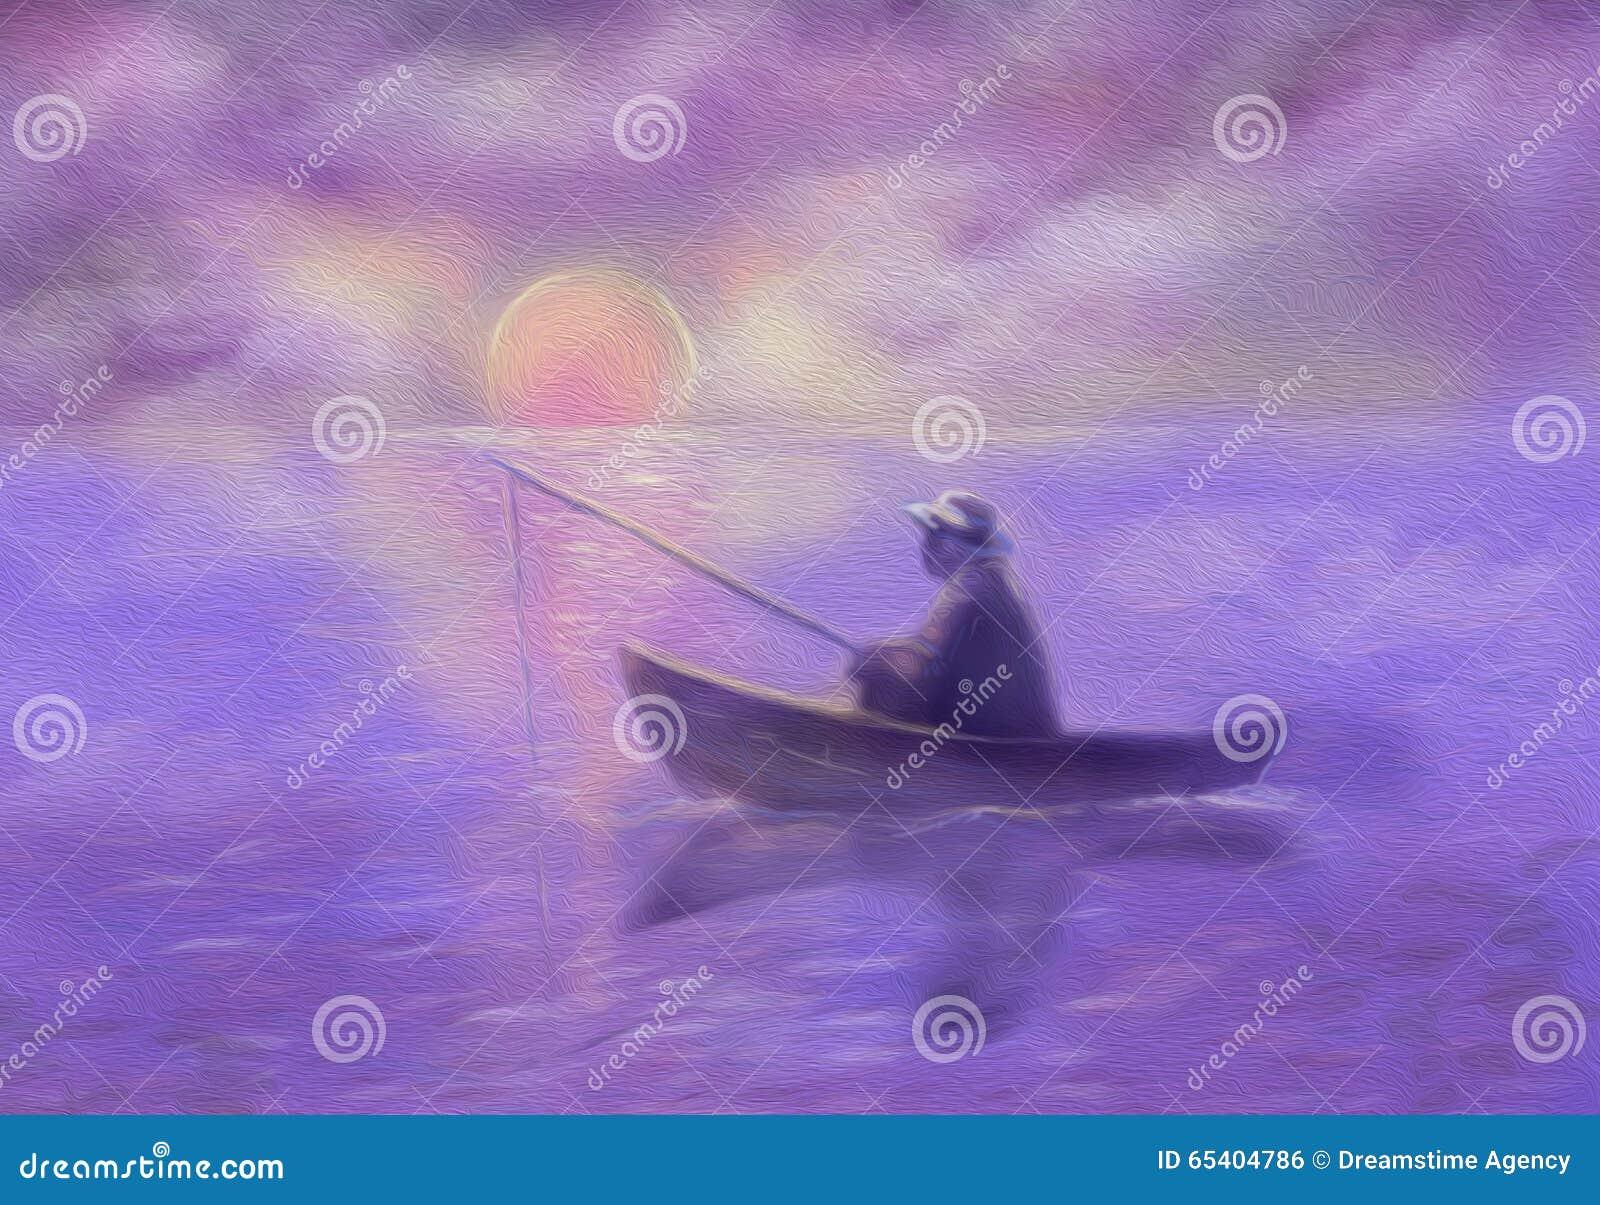 Mann im Hut fängt Fische bei Sonnenaufgang Abbildung